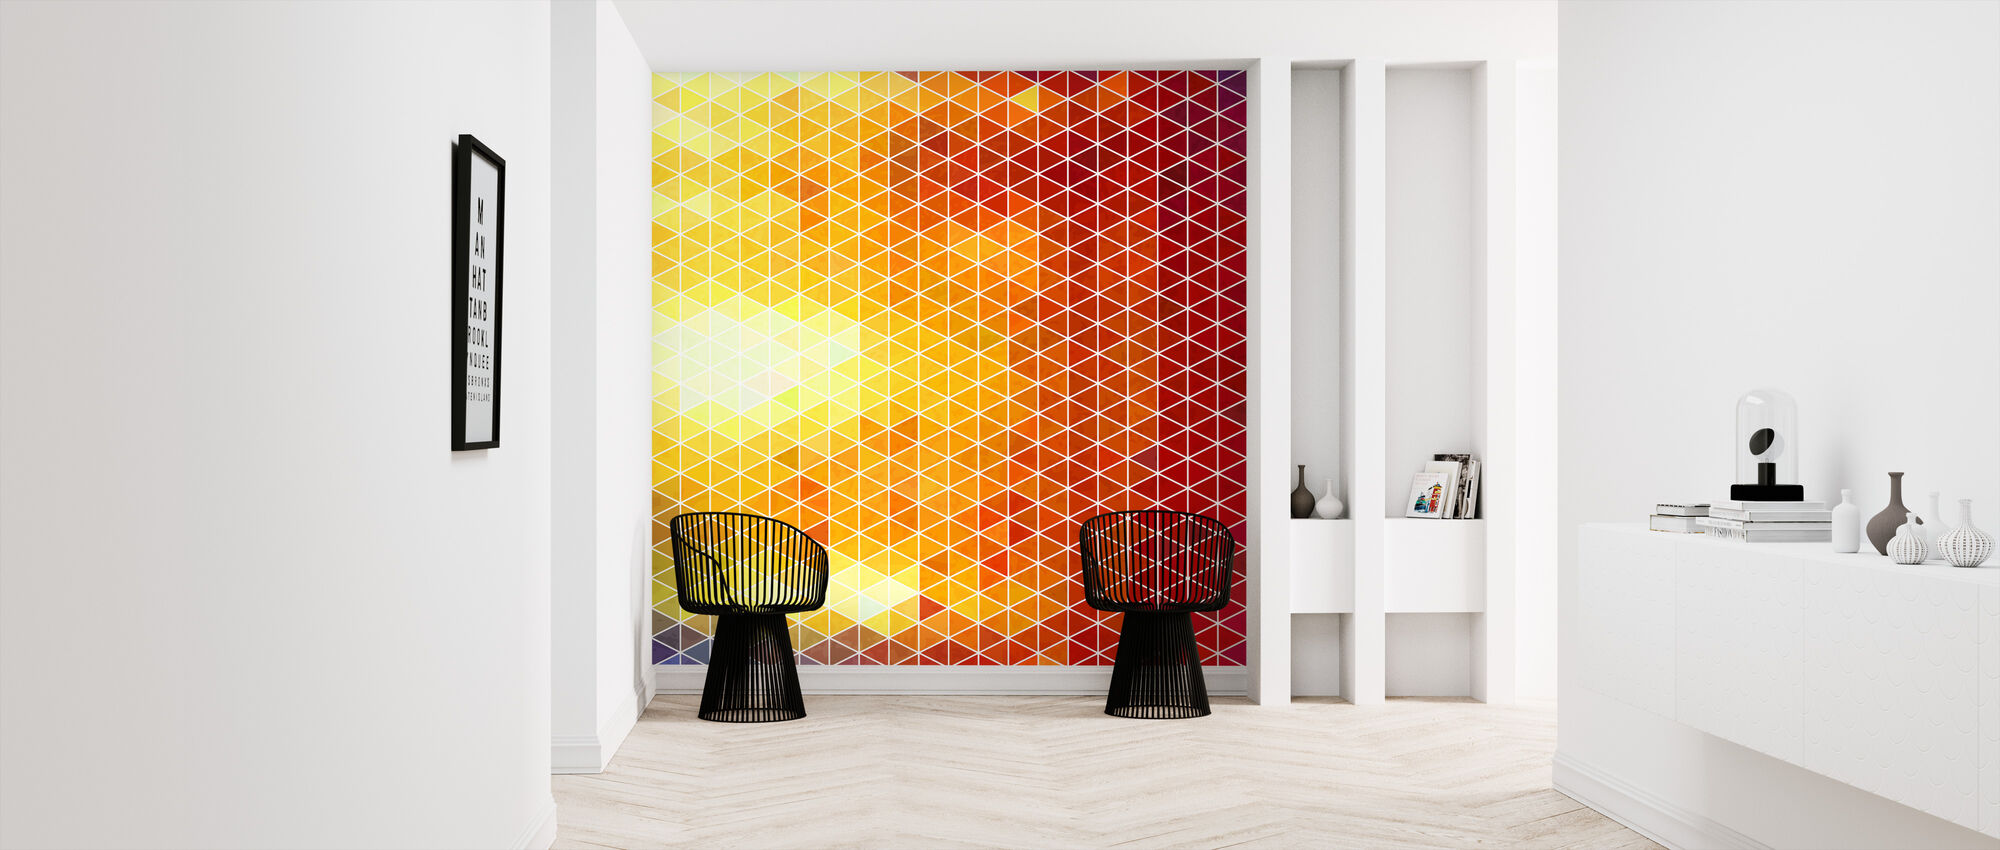 No Gradients - Wallpaper - Hallway